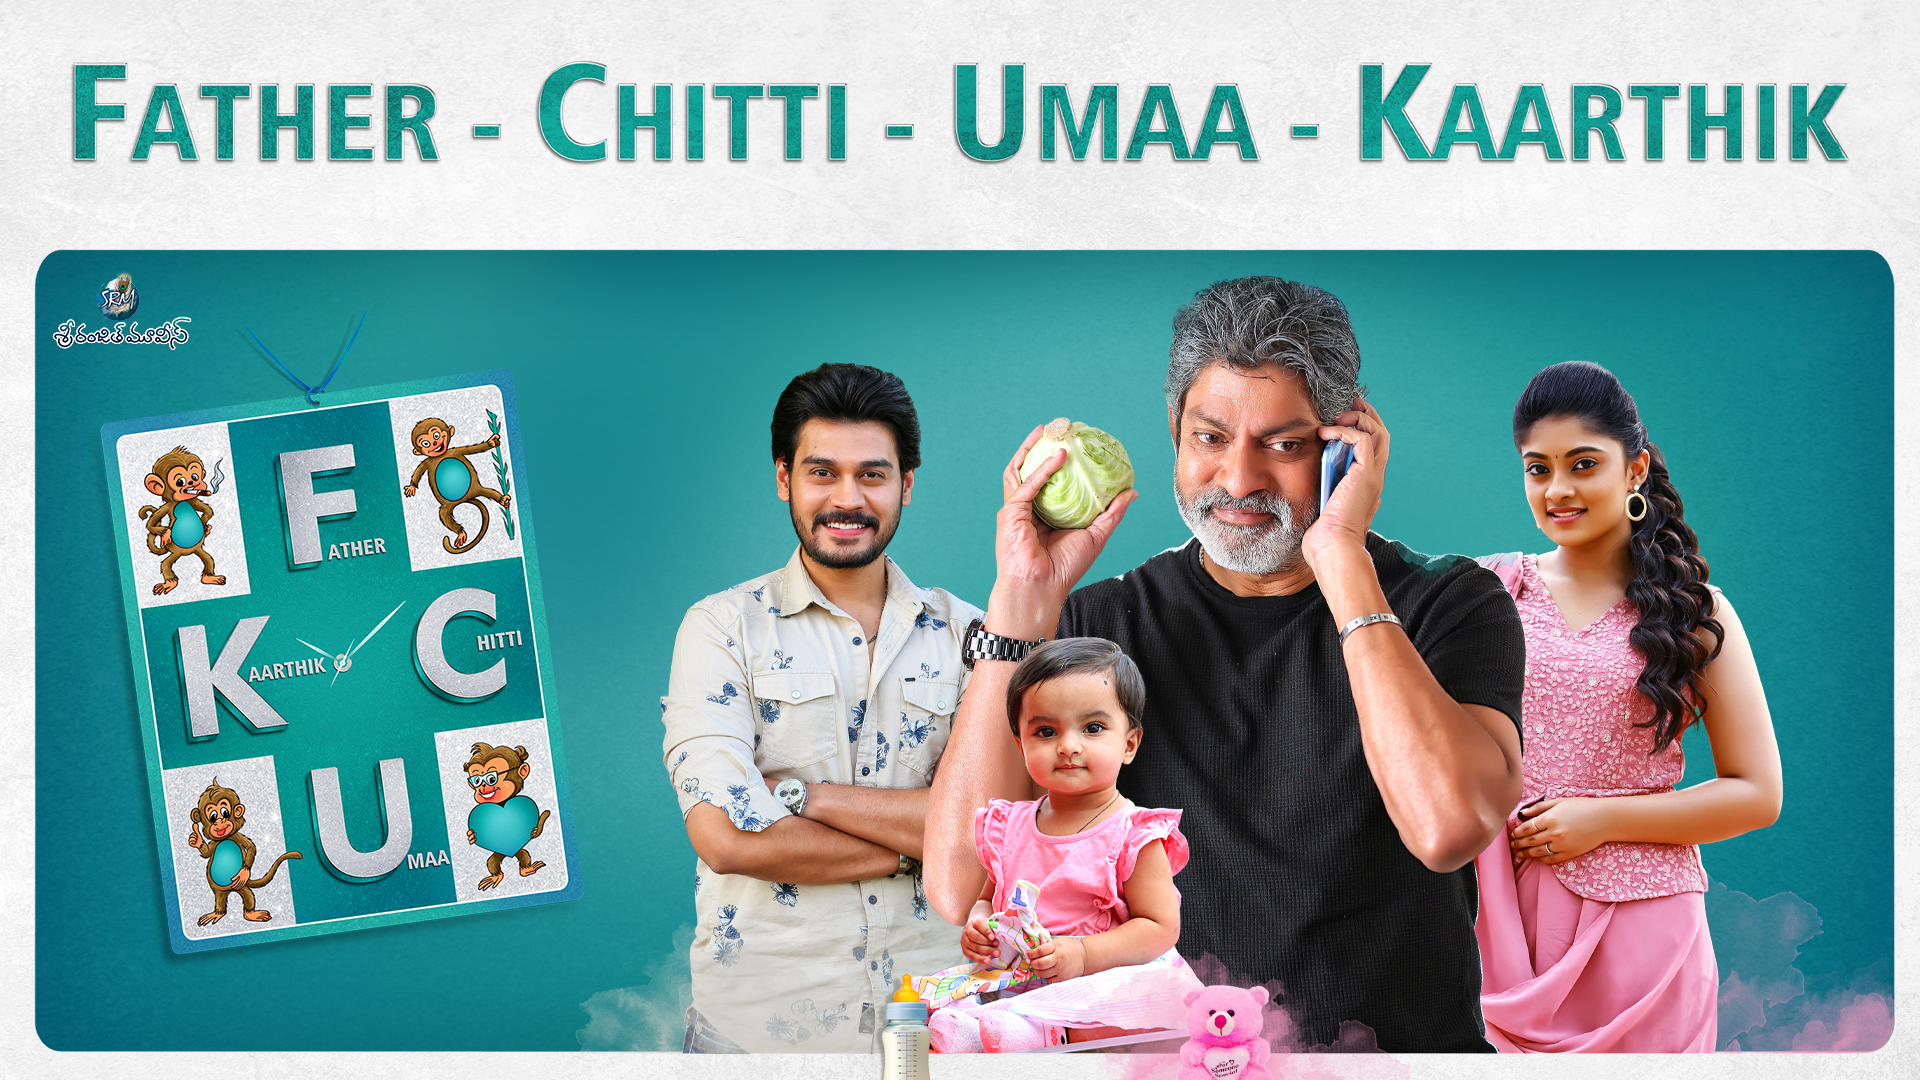 FCUK (Father, Chitti, Umaa, Kaarthik)